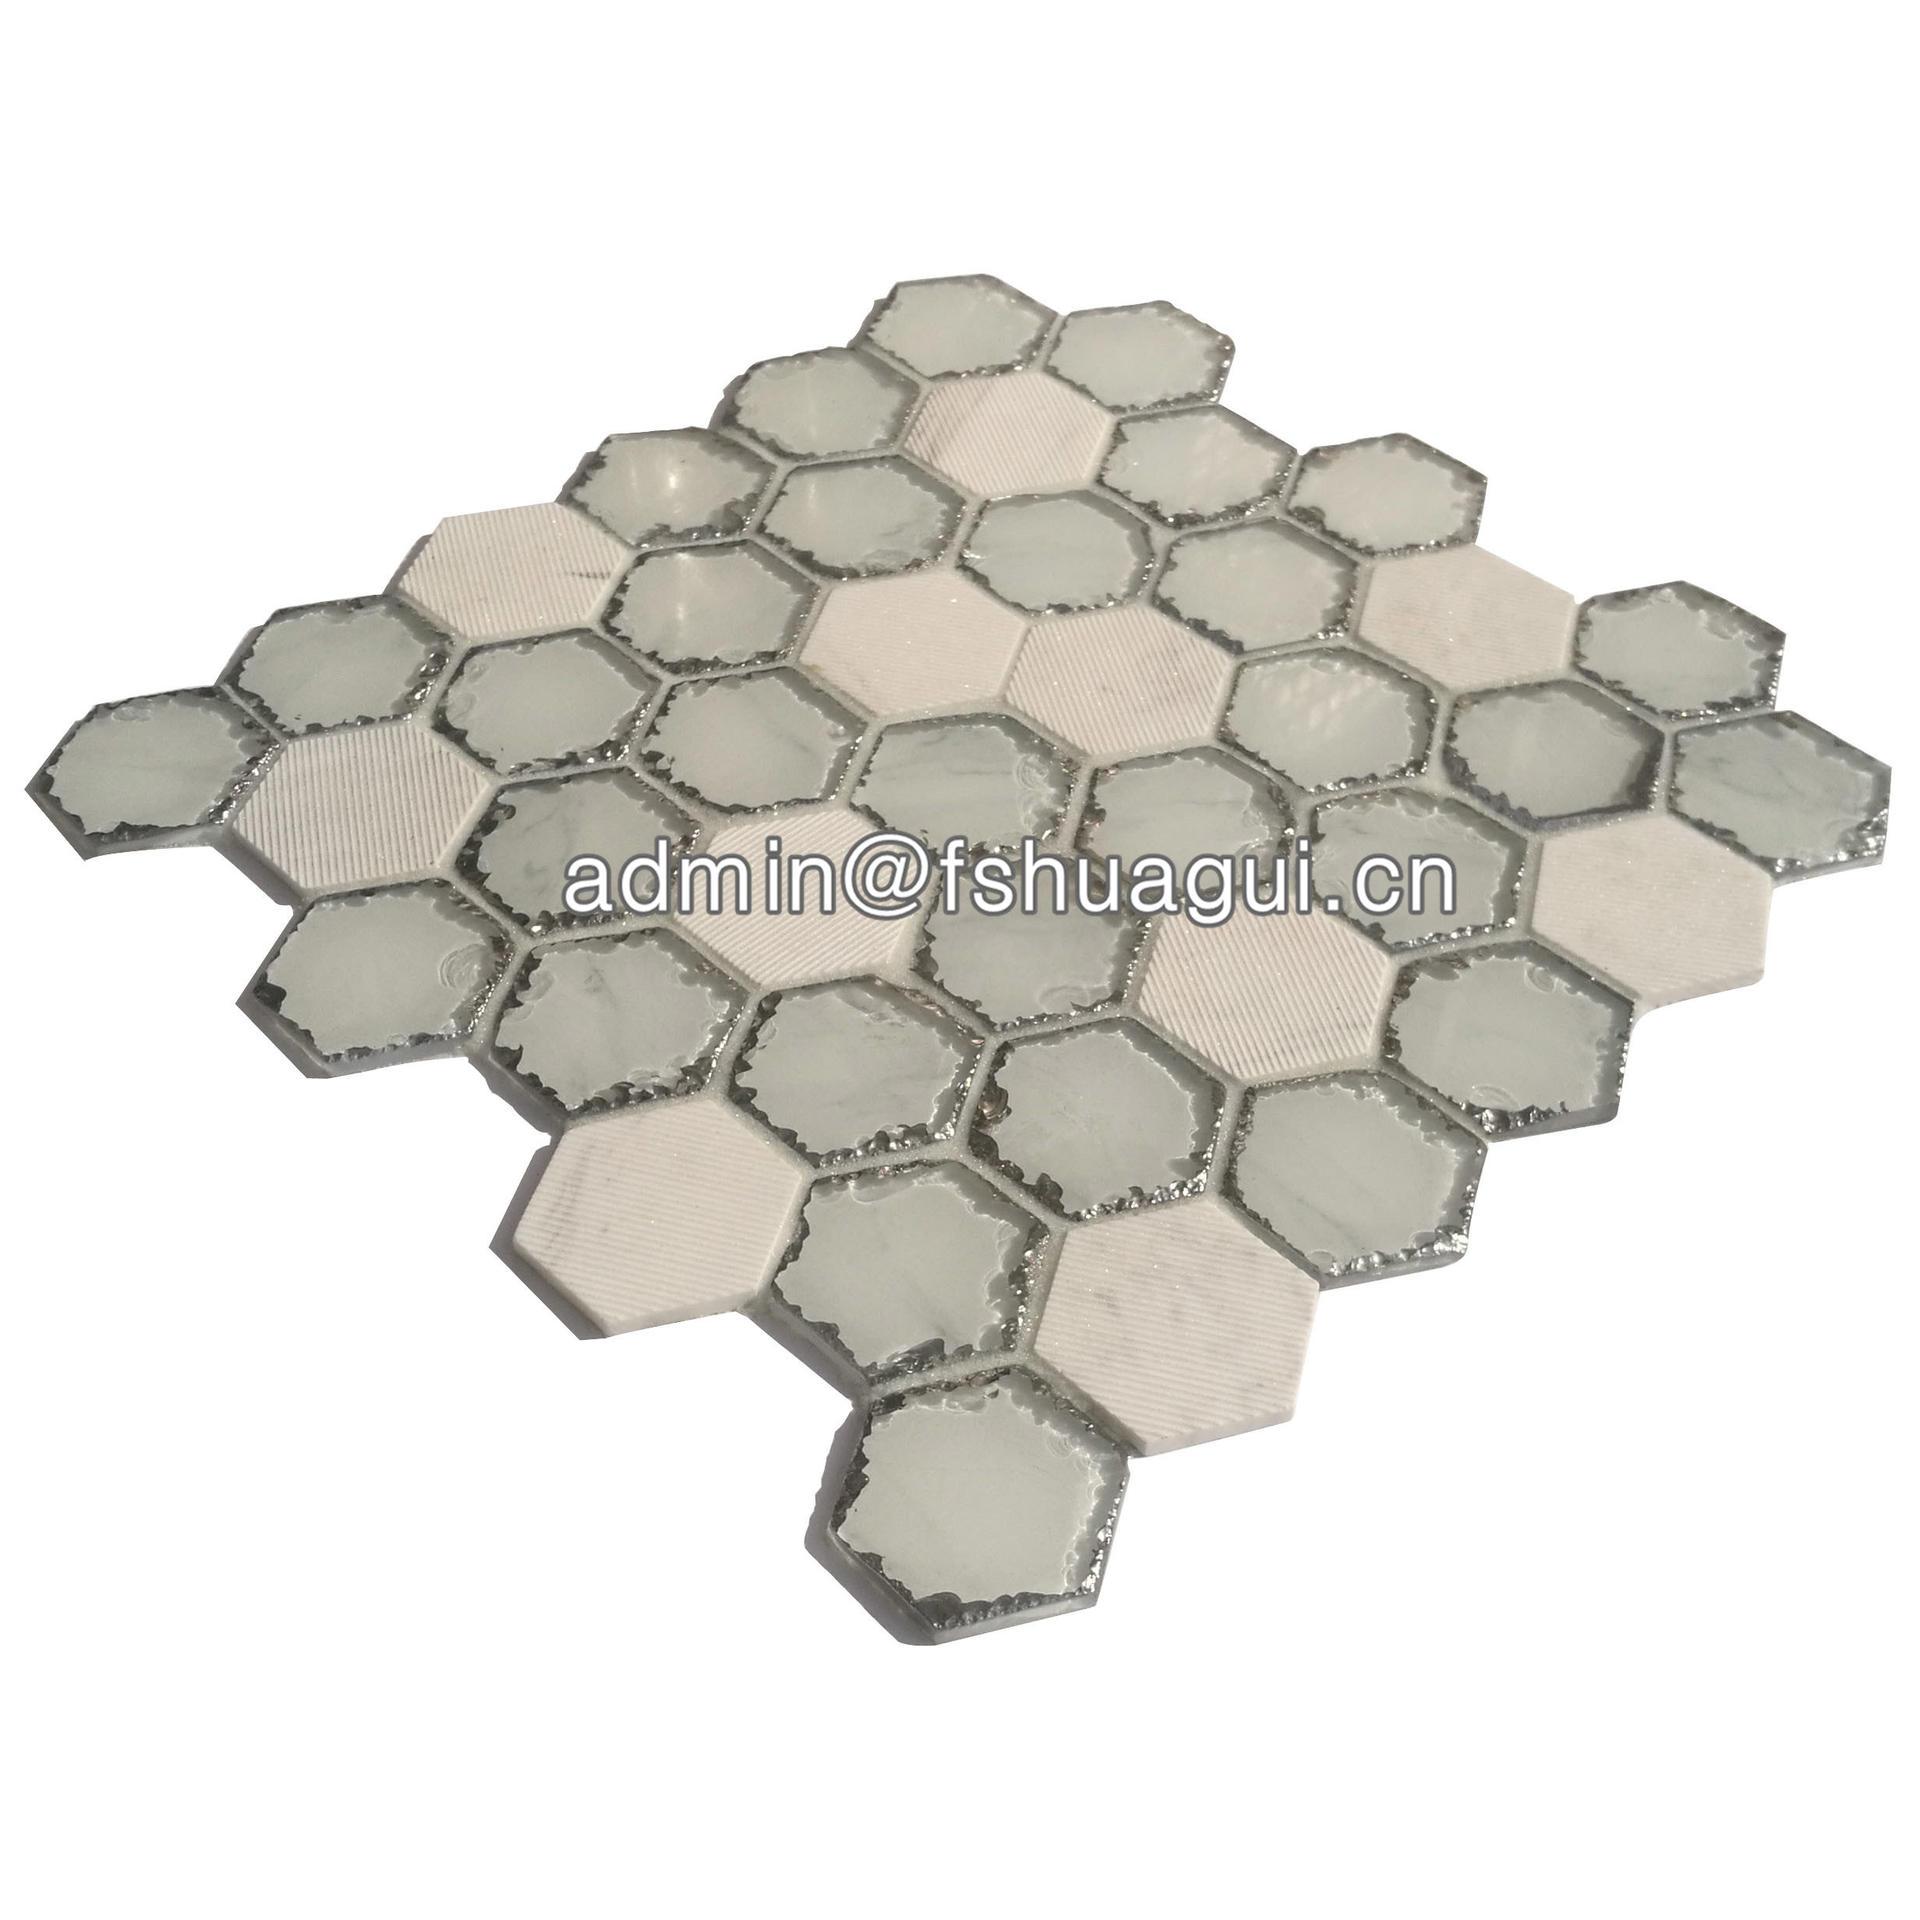 Carrara white stone blend glass hexagon mosaic tiles splashback